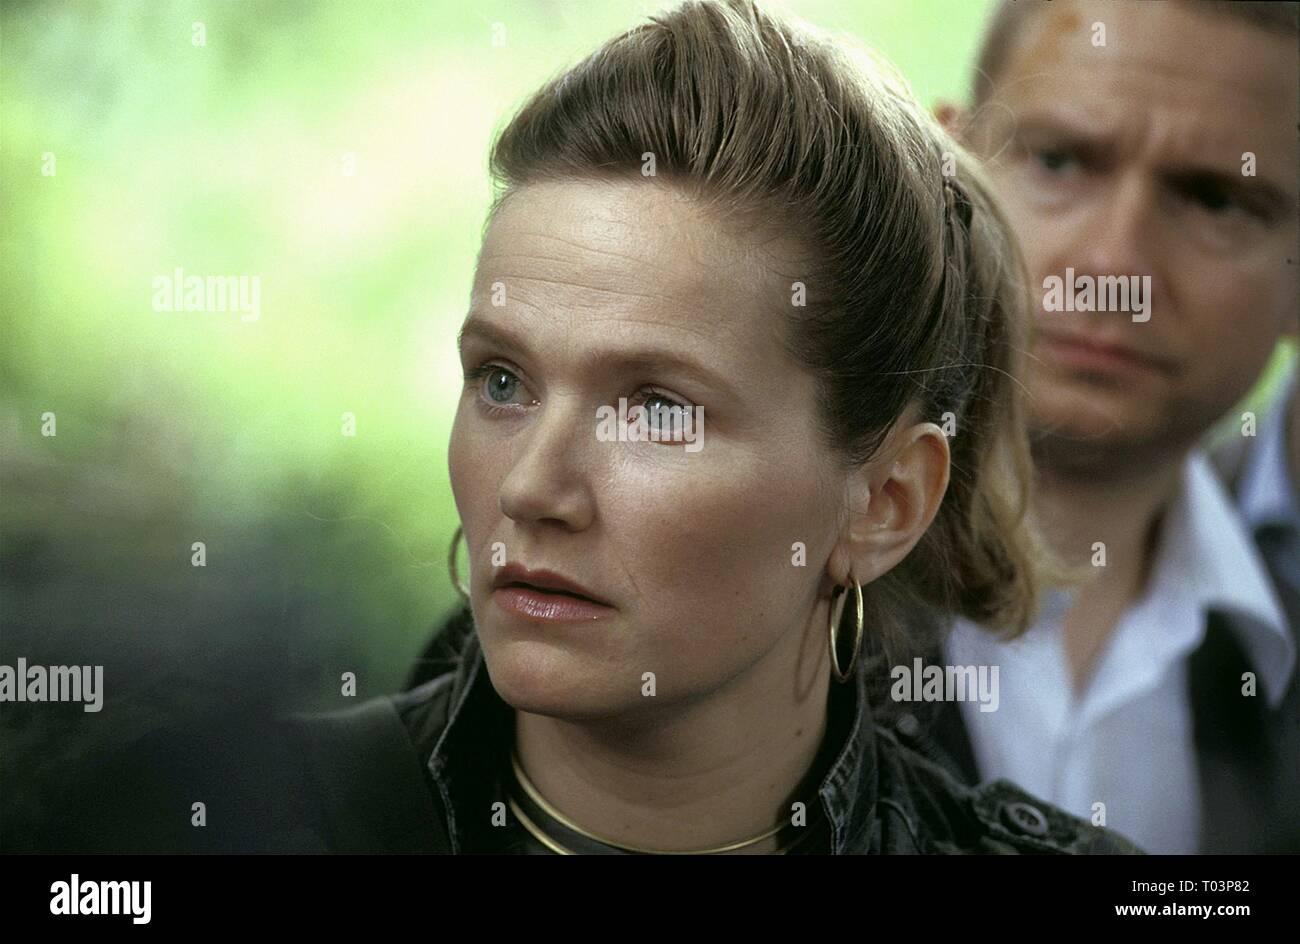 JESSICA STEVENSON, SHAUN OF THE DEAD, 2004 - Stock Image